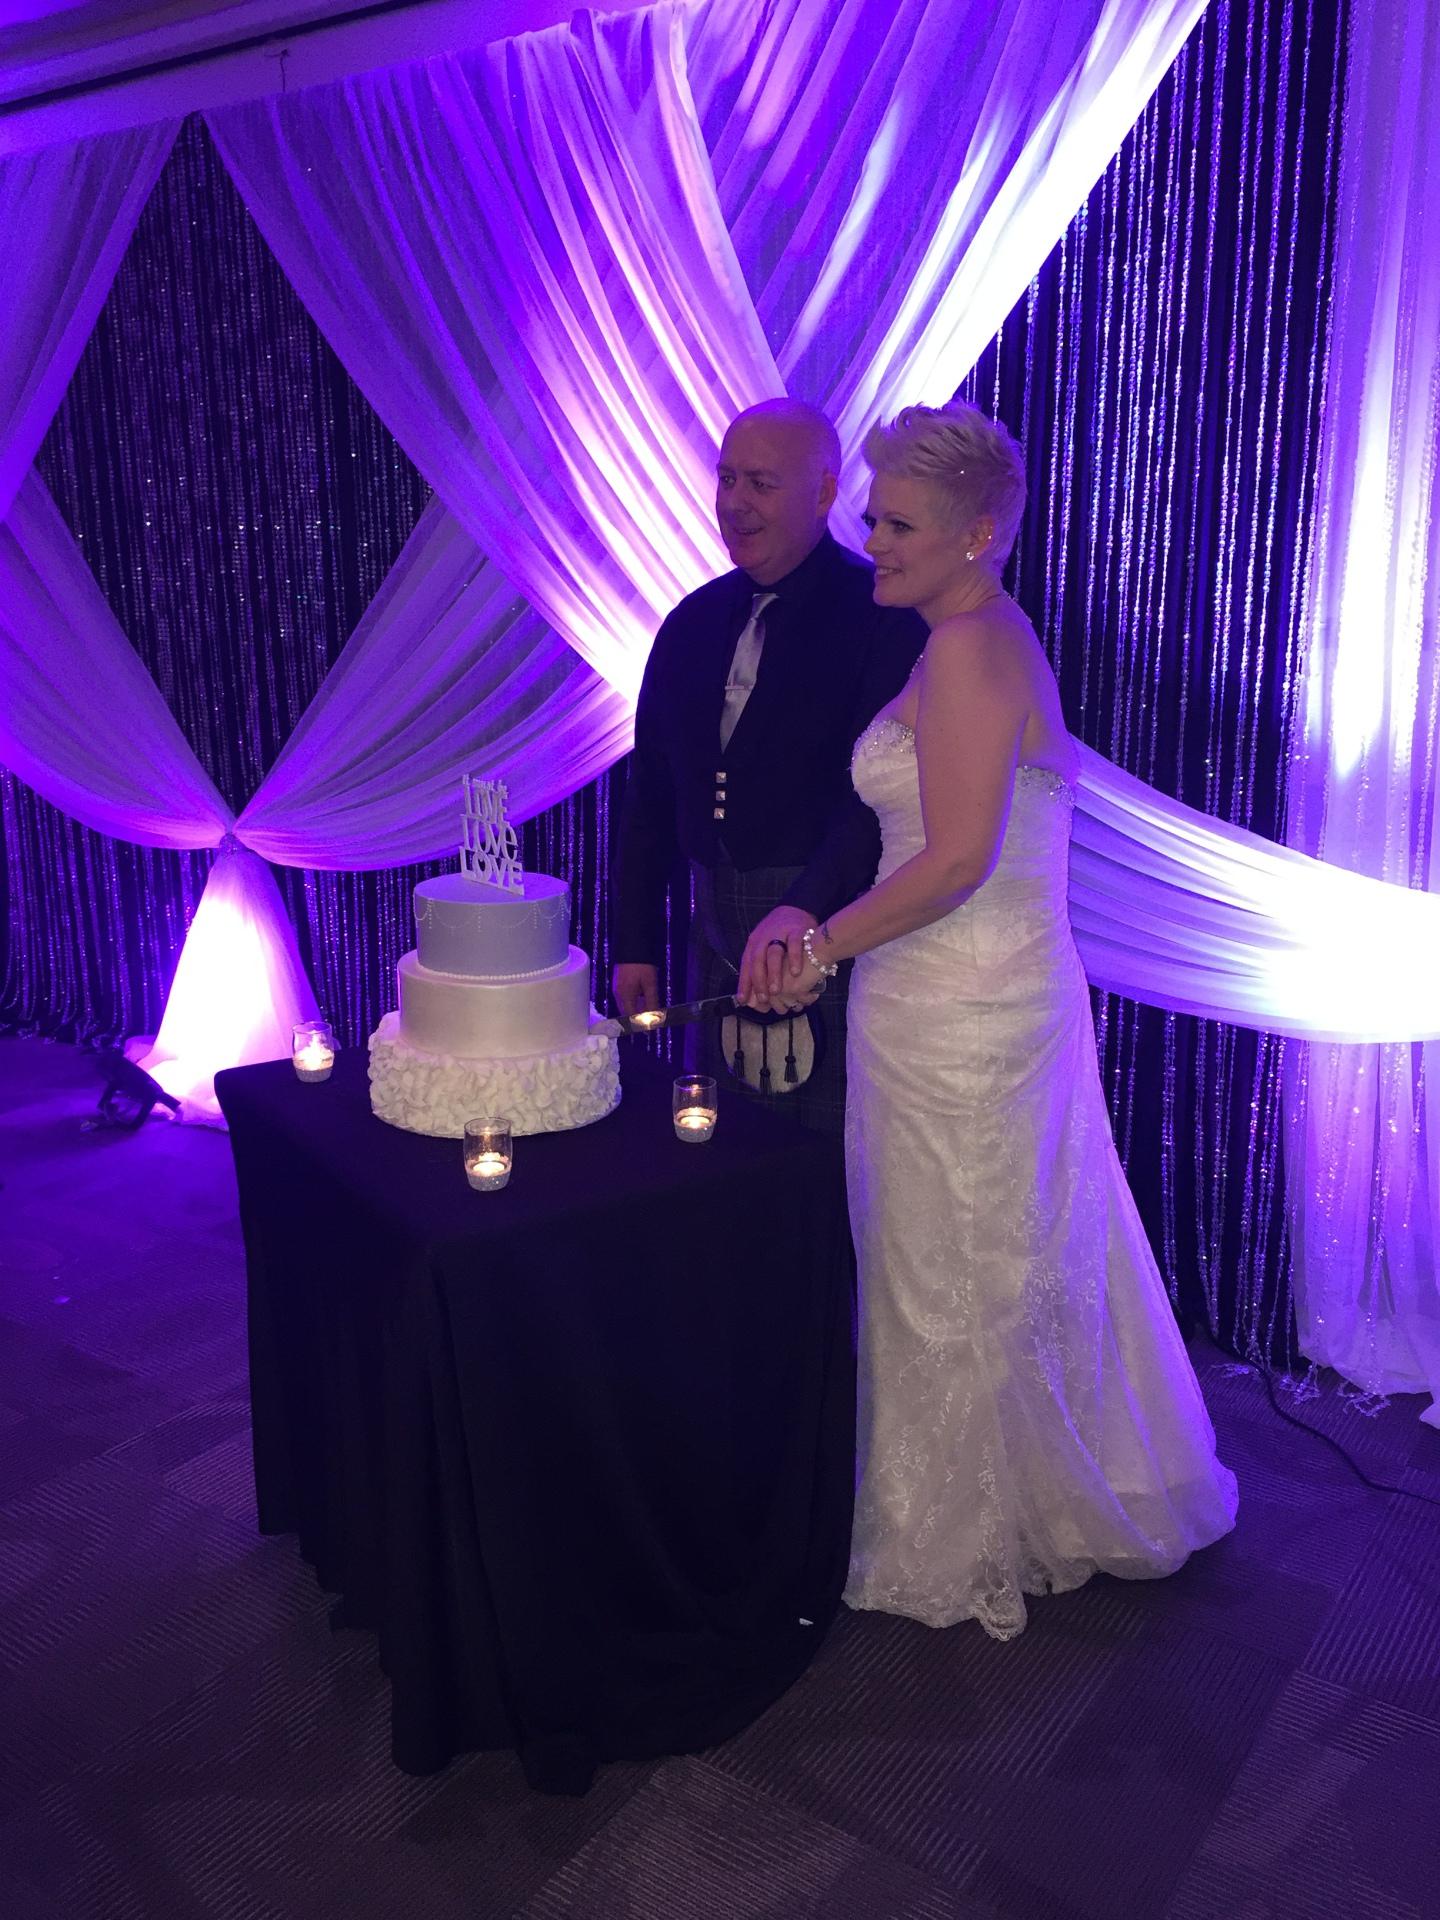 Amazing bride and groom